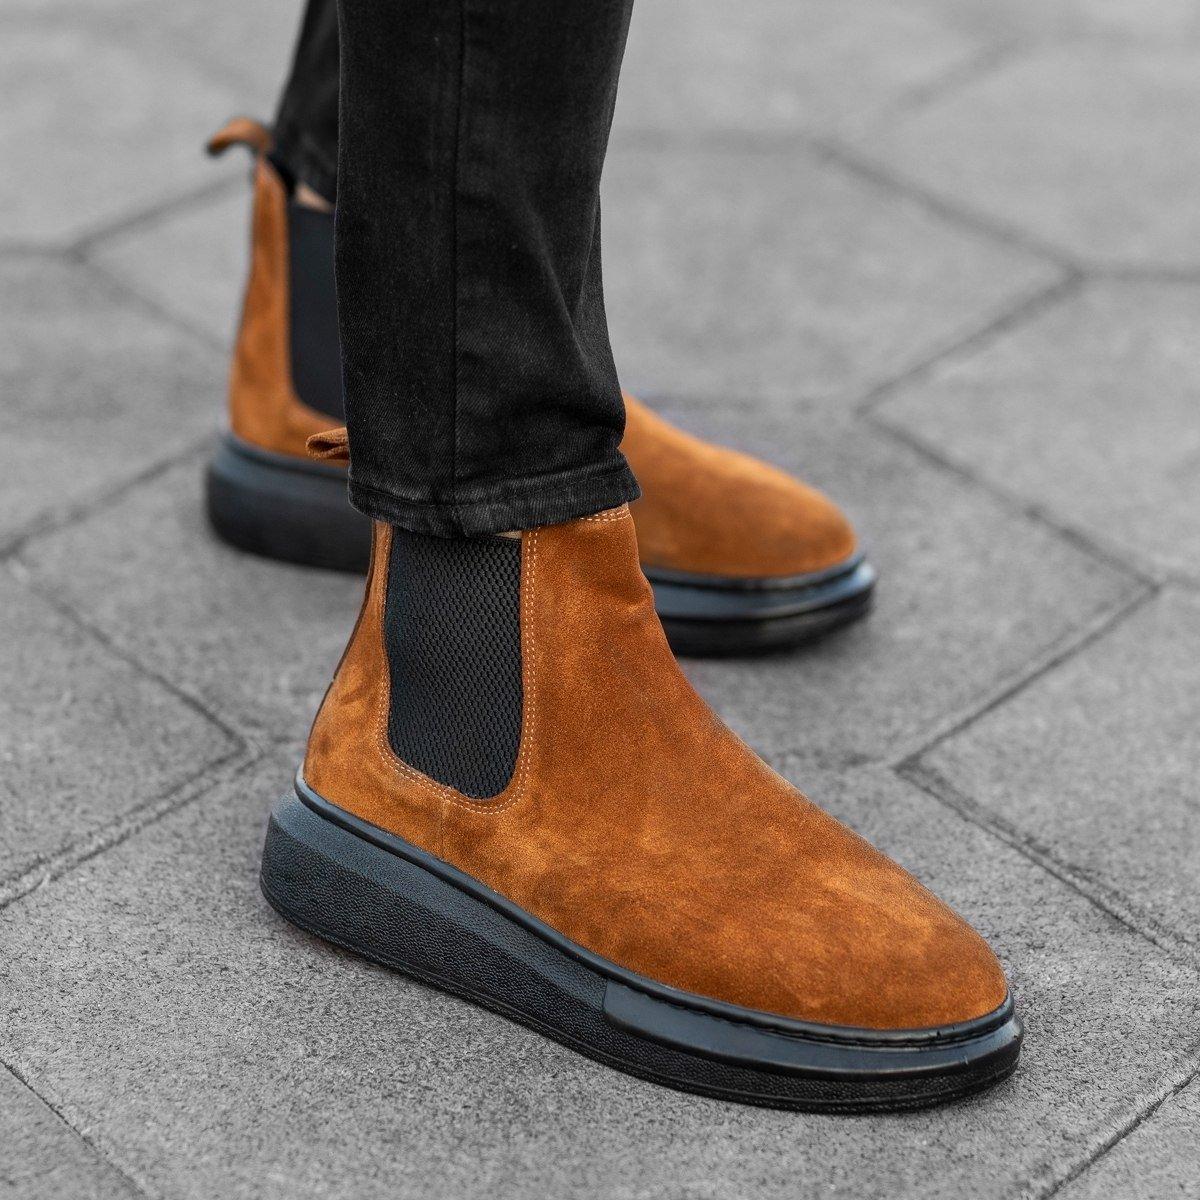 Genuine-Suede Hype Sole Chelsea Boots In Brown Mv Premium Brand - 1